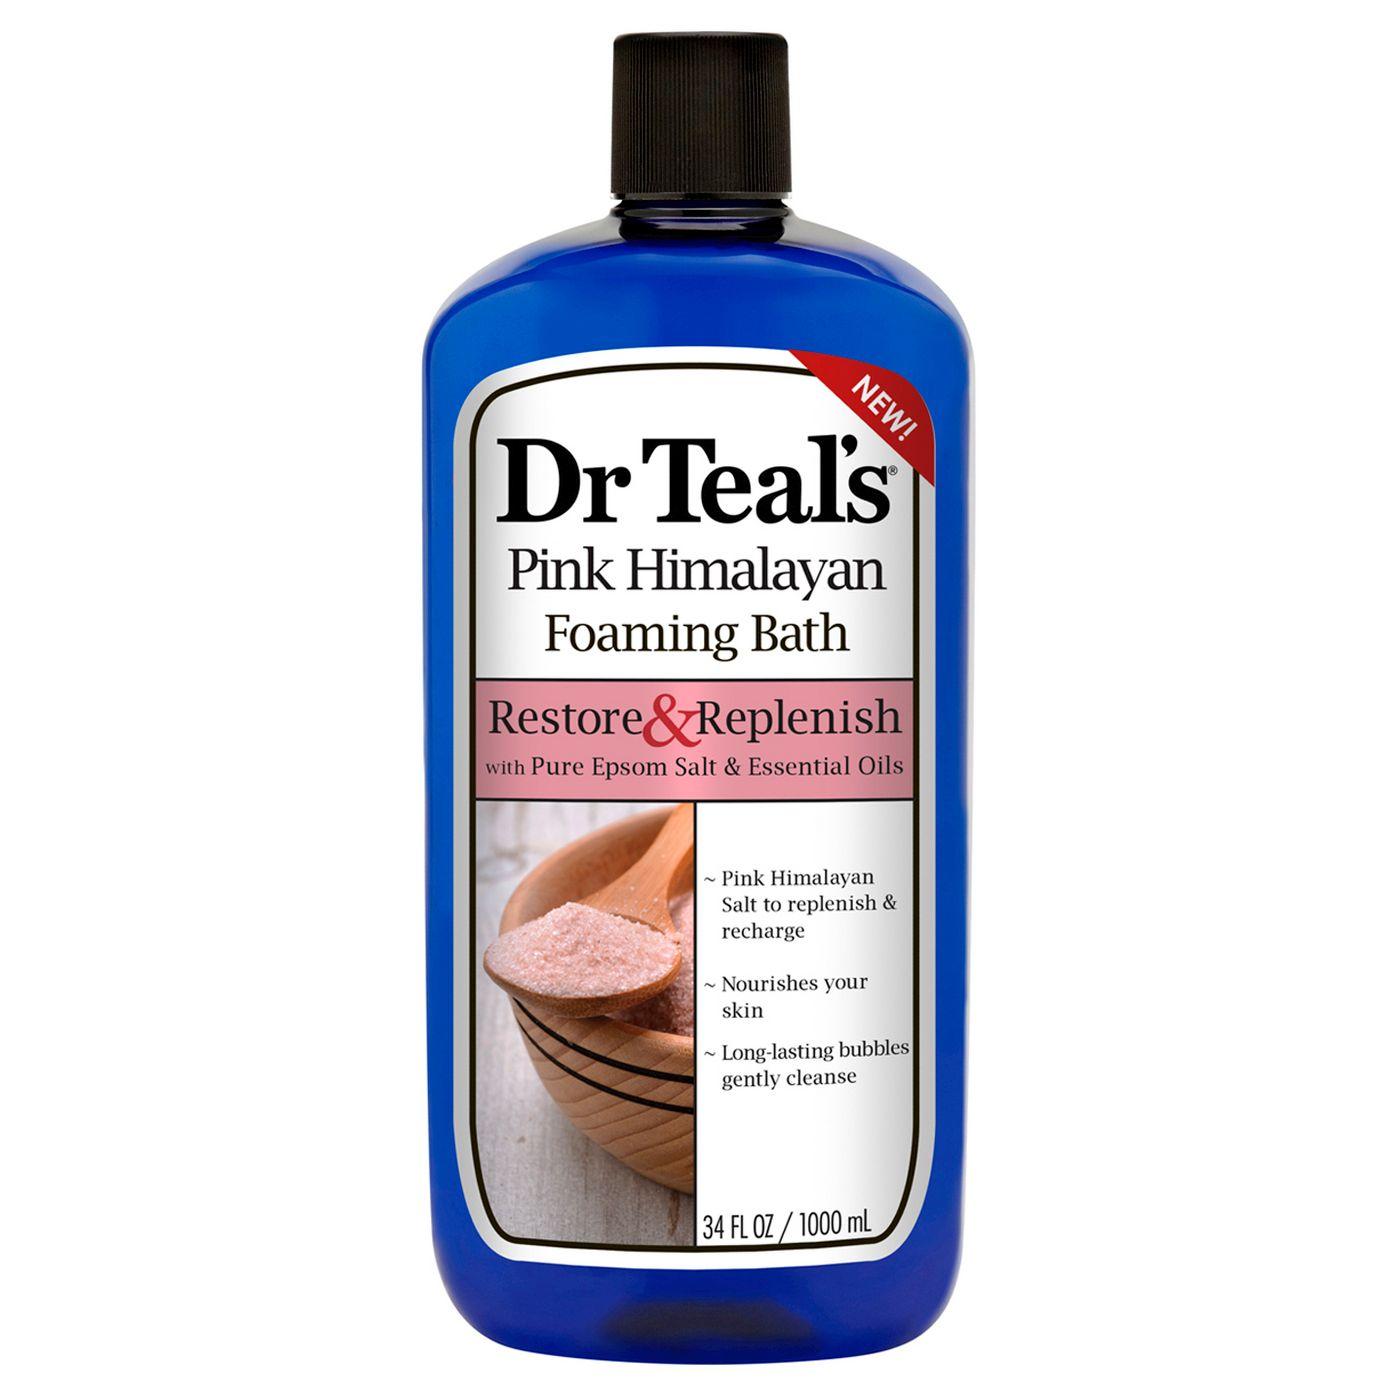 Dr Teal's Pure Epsom Salt & Essential Oils Restore & Replenish Pink Himalayan Foaming Bath